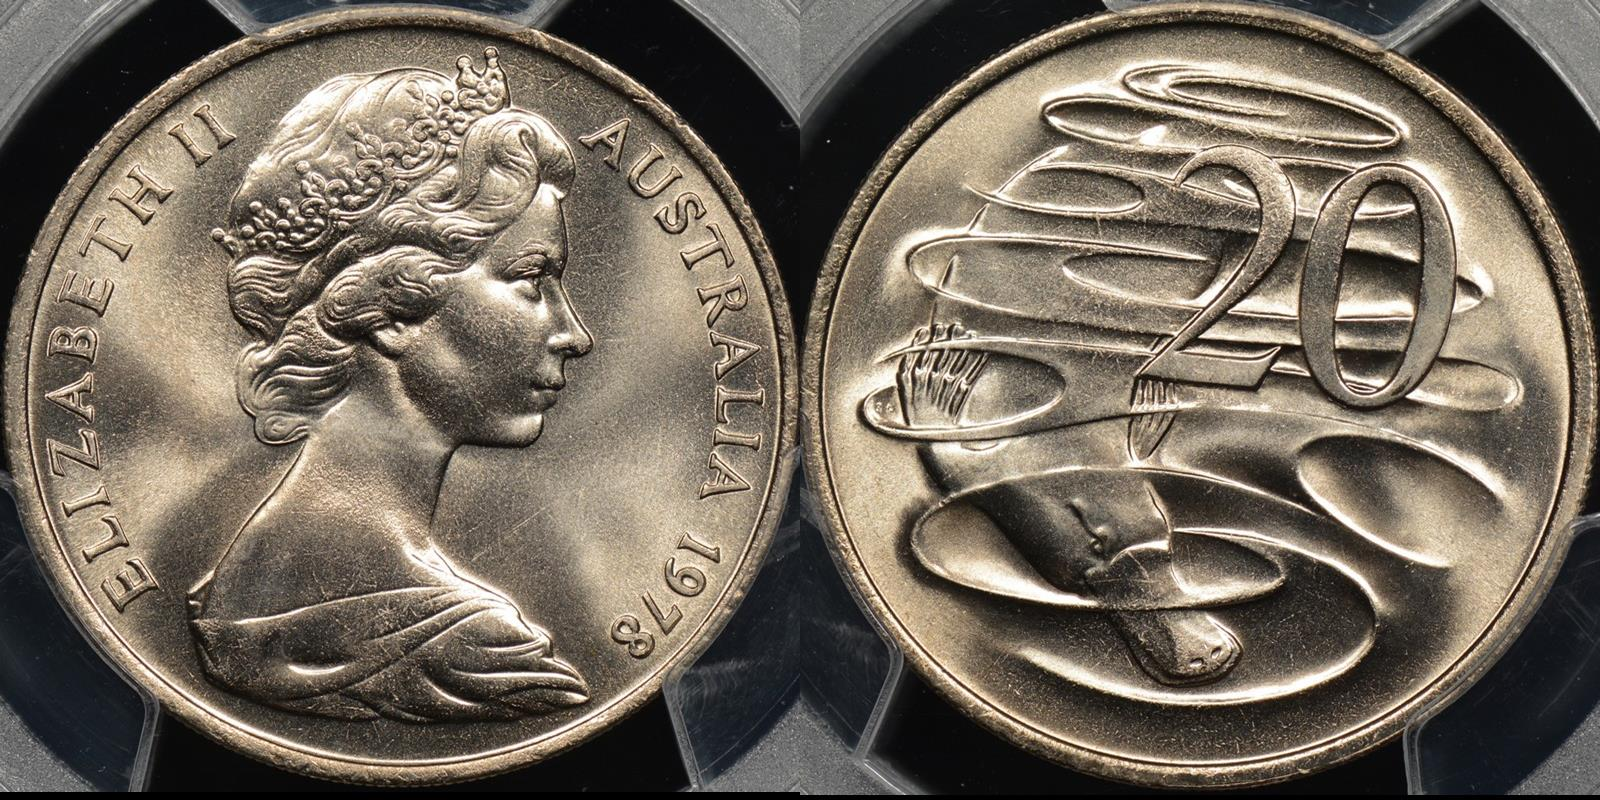 Australia 1978 20 Cent Gem Uncirculated Pcgs Ms65 The Purple Penny